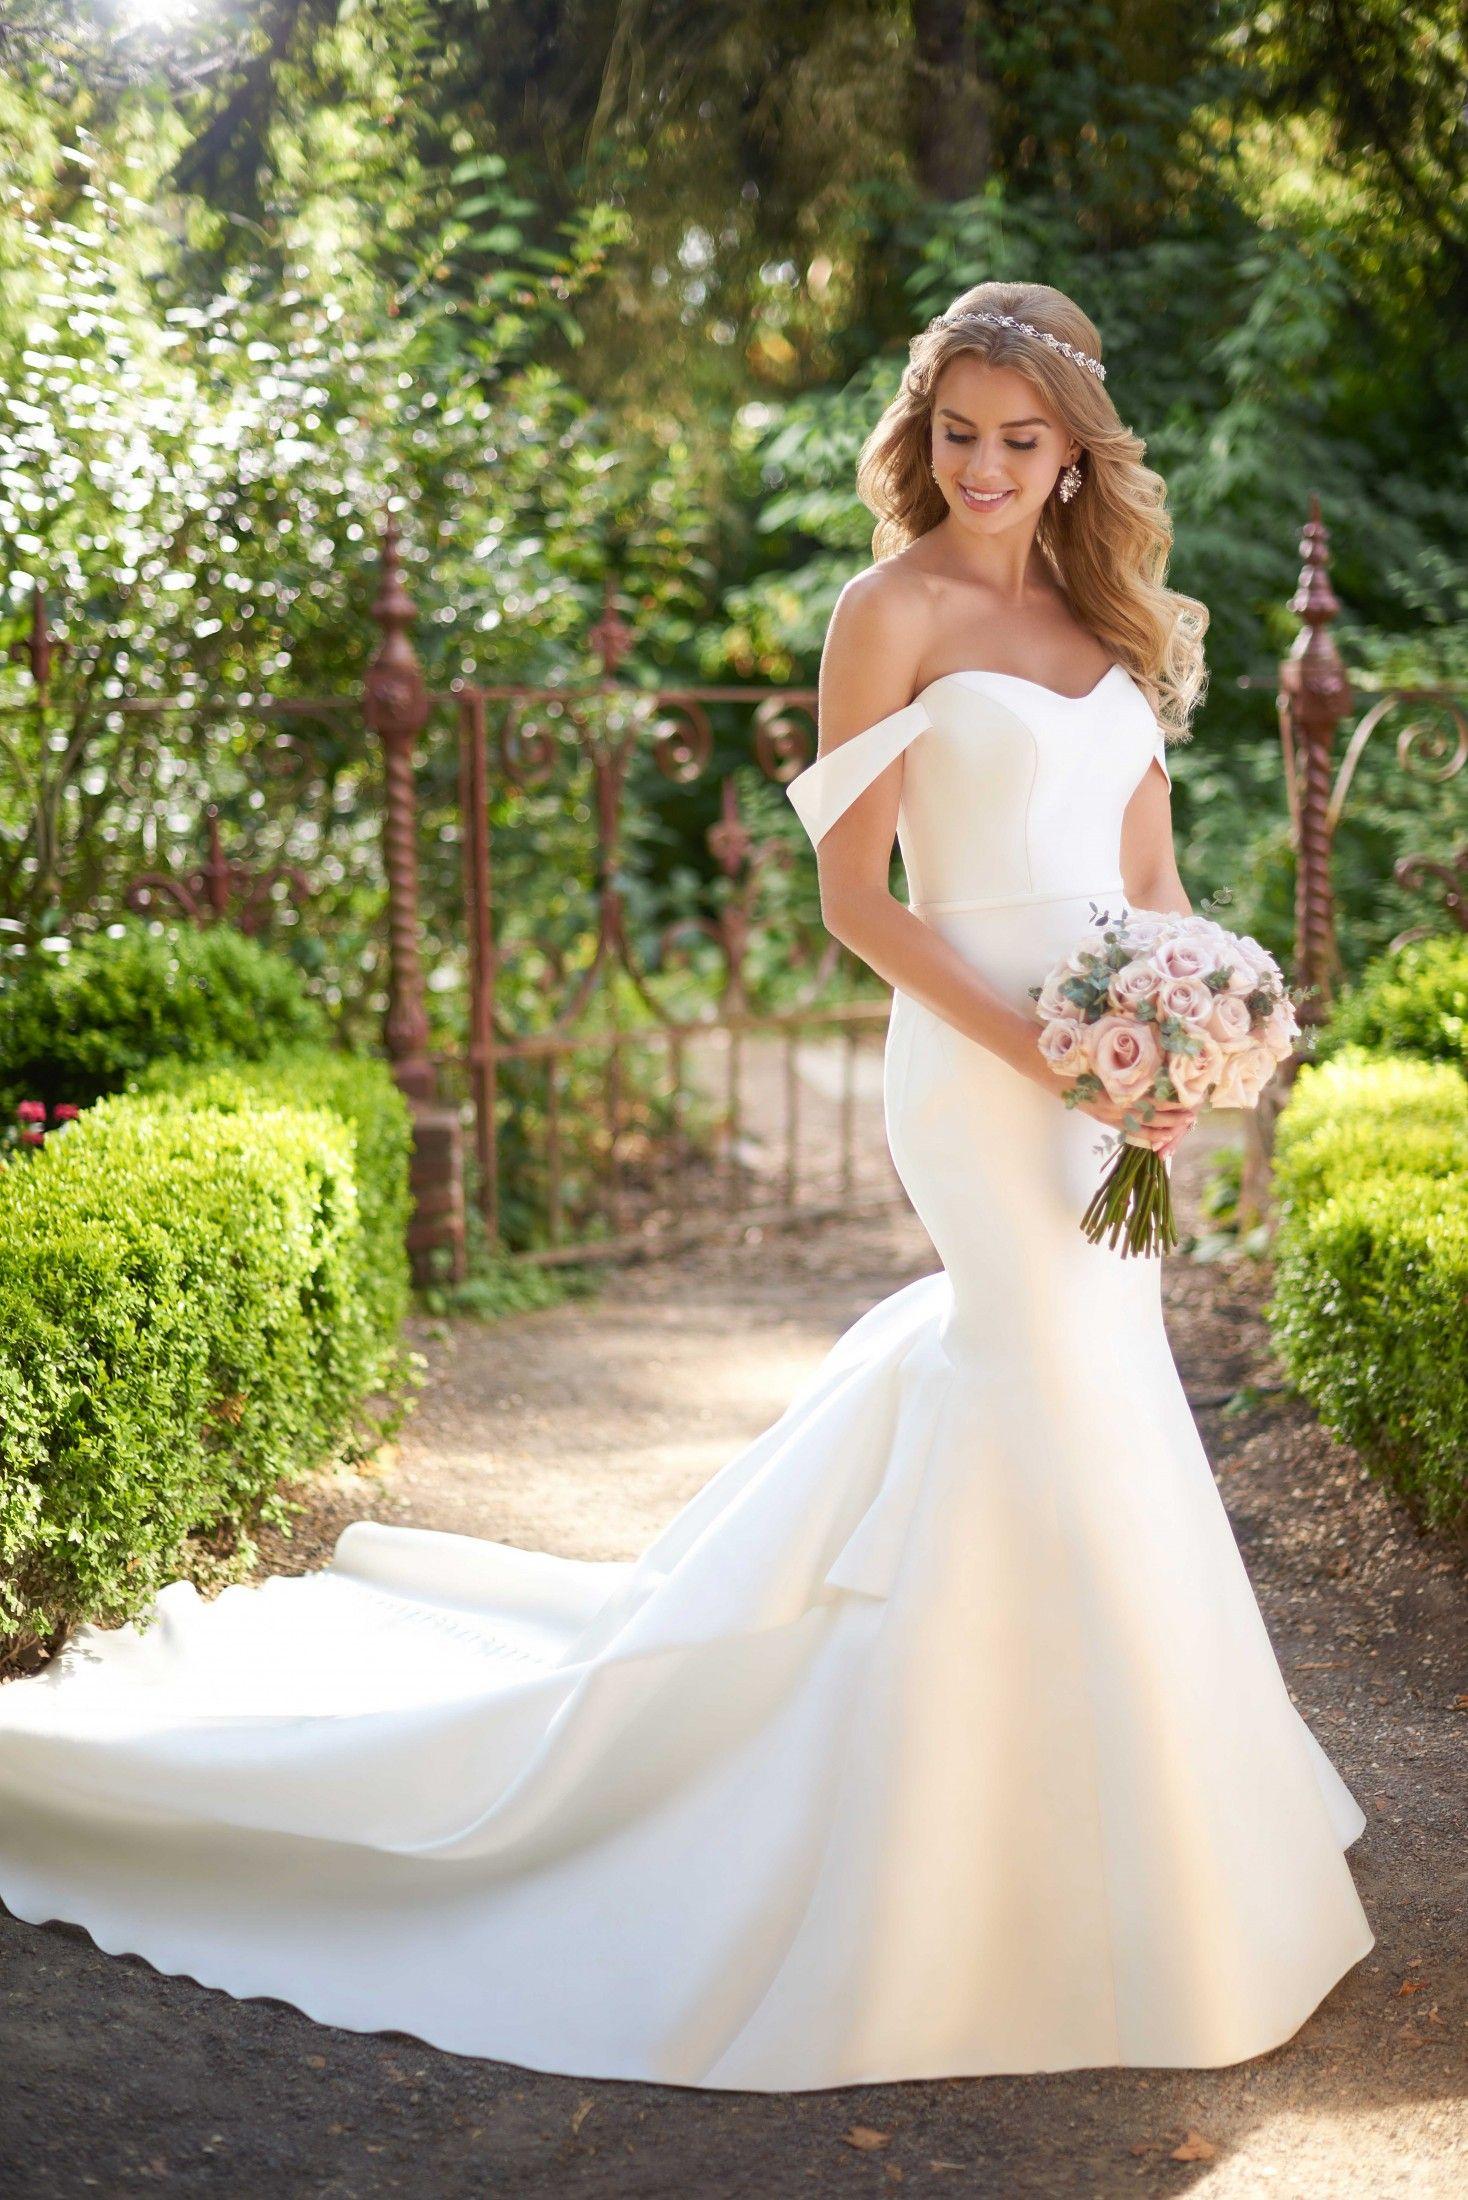 Blush mermaid wedding dress  ad Looking for wedding inspiration Love mermaid style dresses